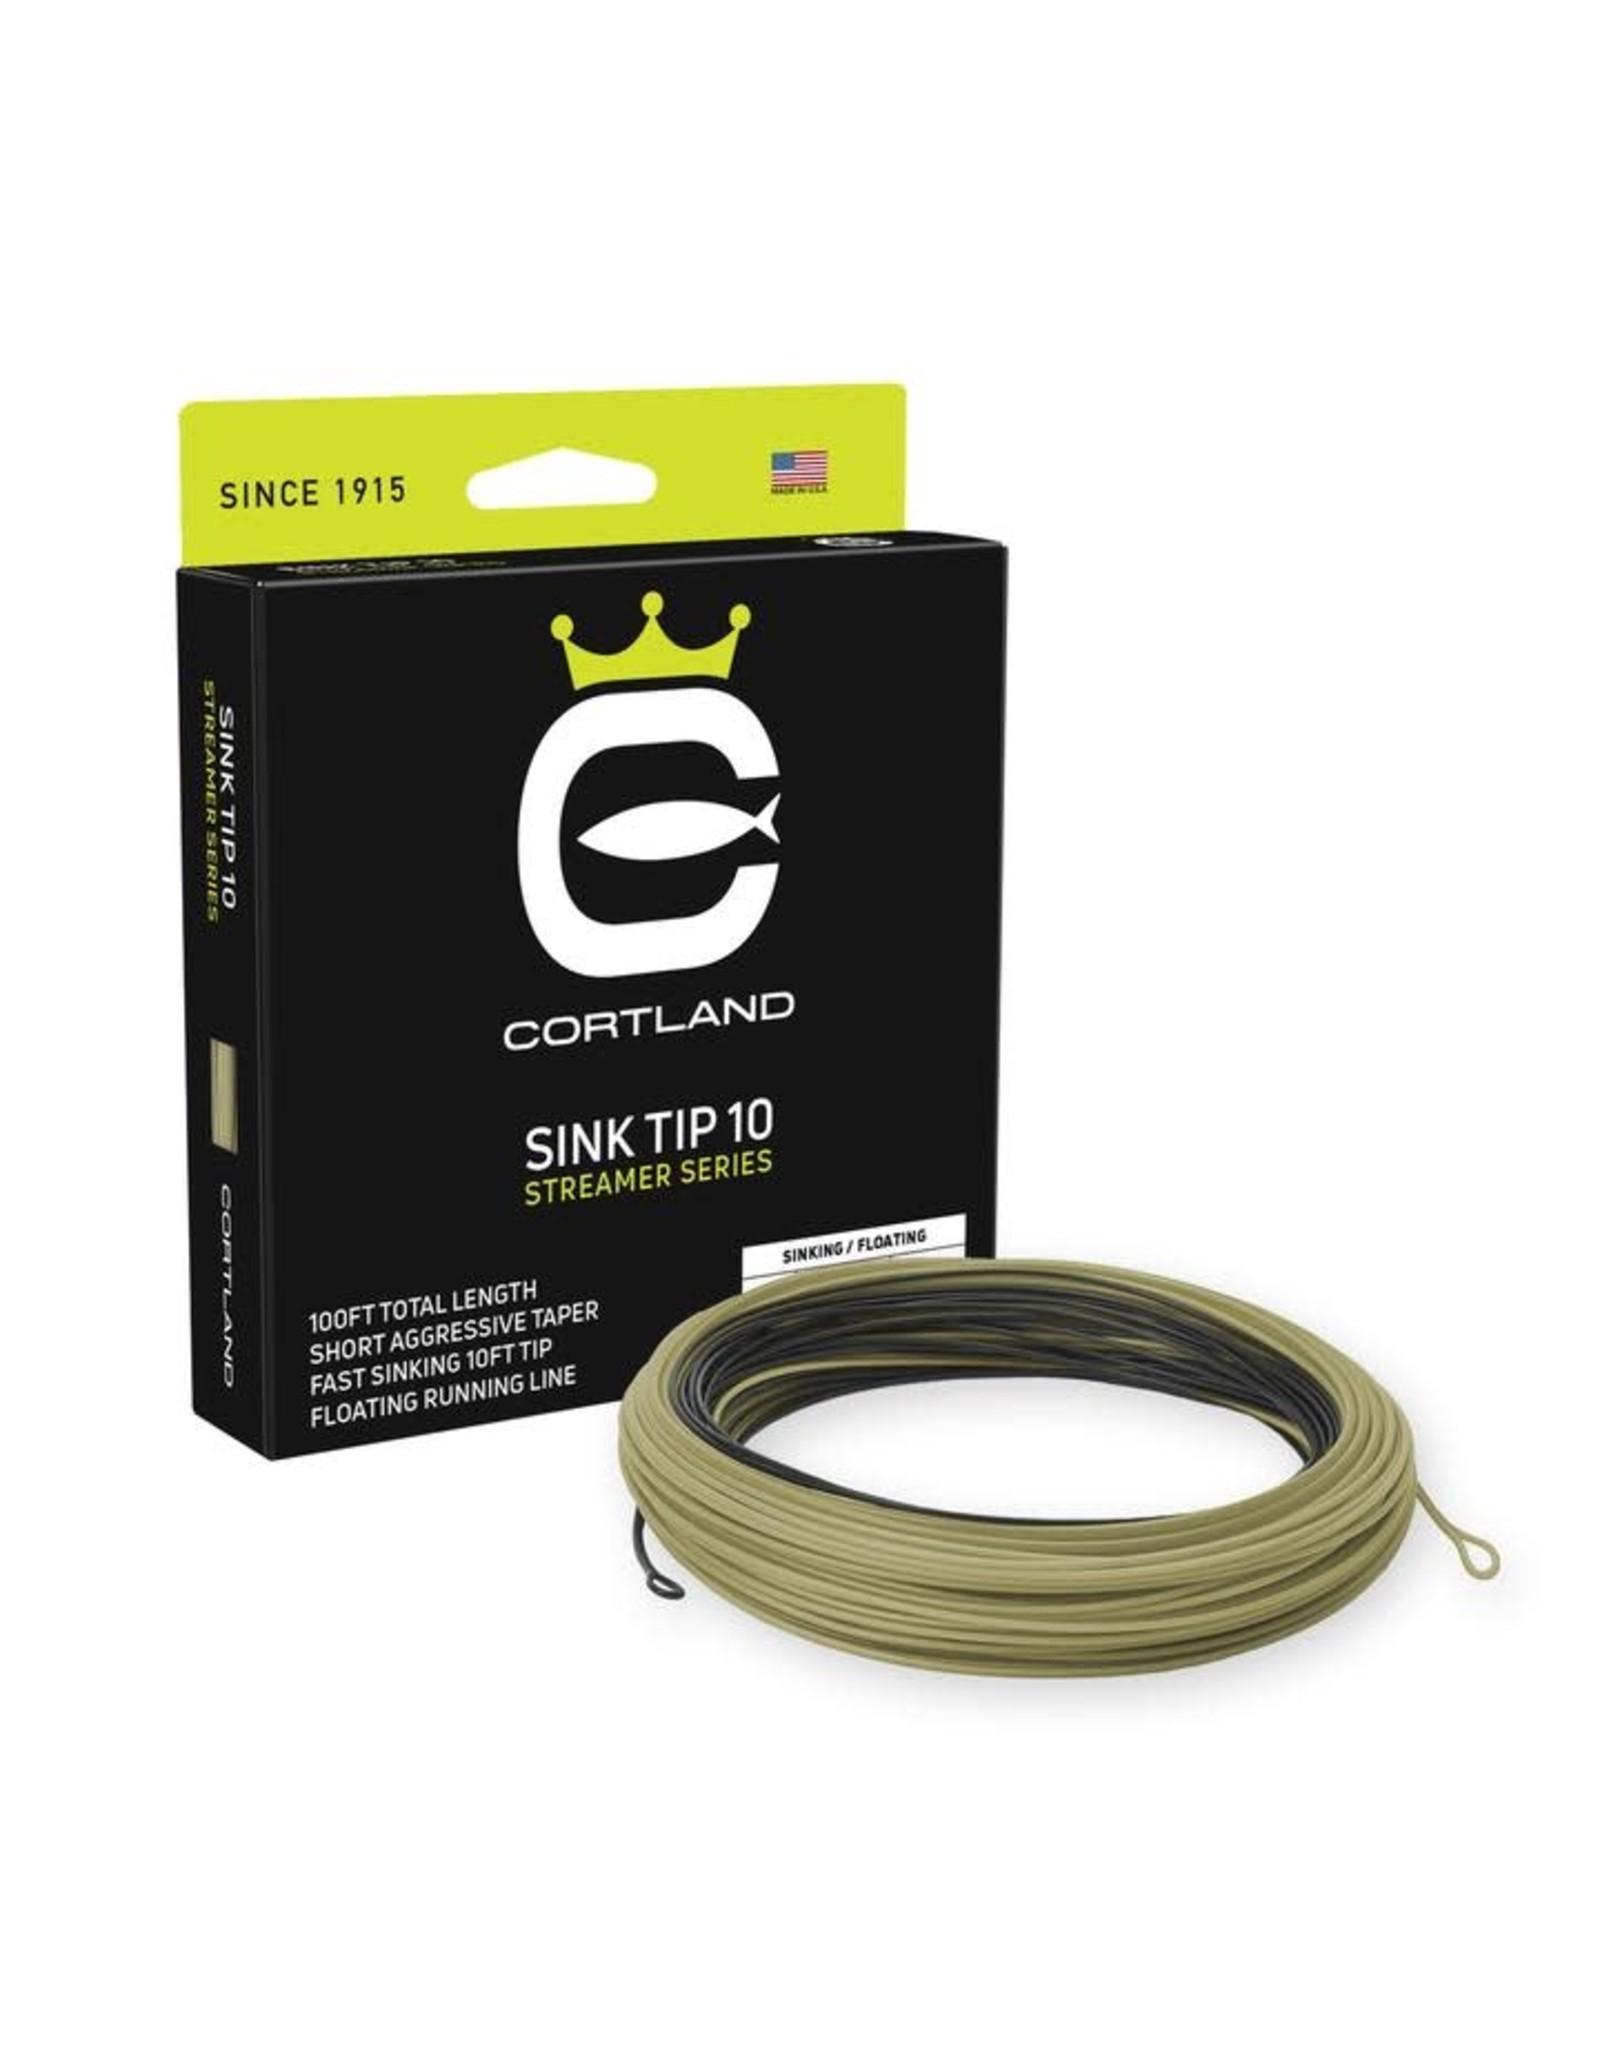 Cortland Line Cortland Streamer Sink Tip 10